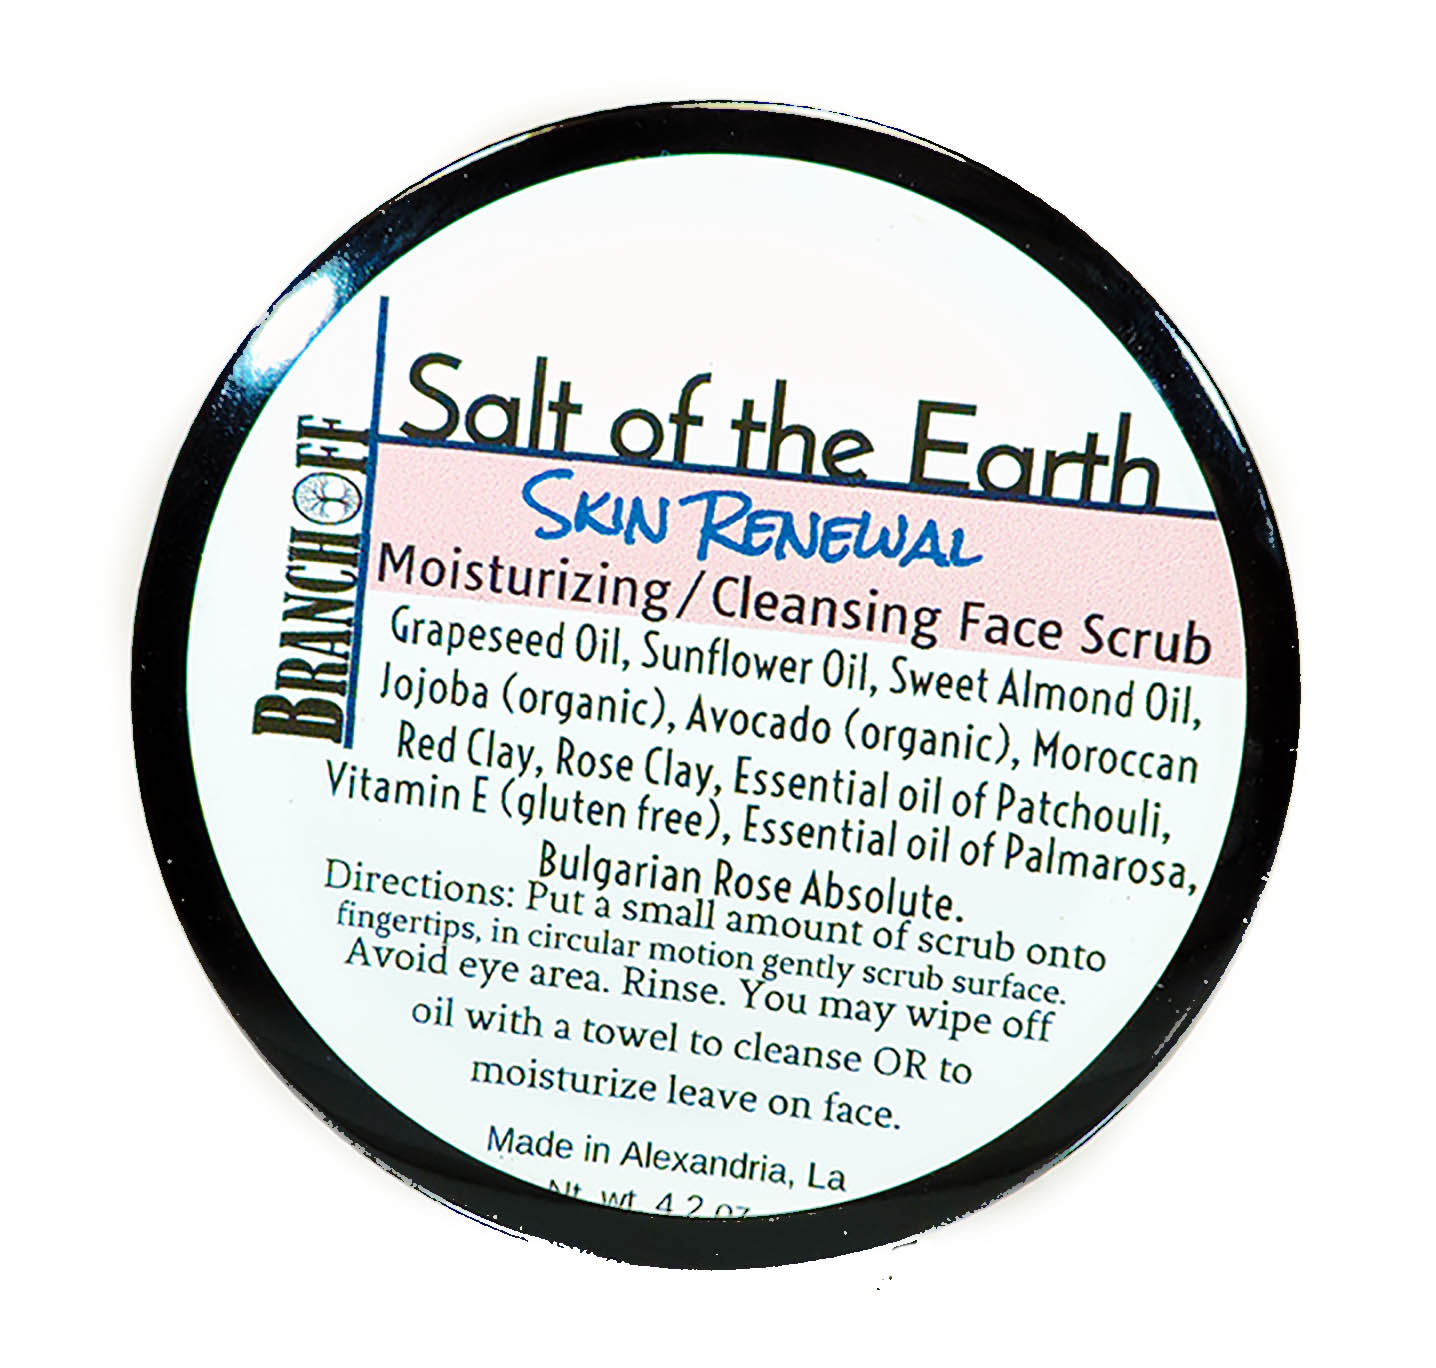 Cleansing, Moisturizing, Himalayan Sea Salt Scrub